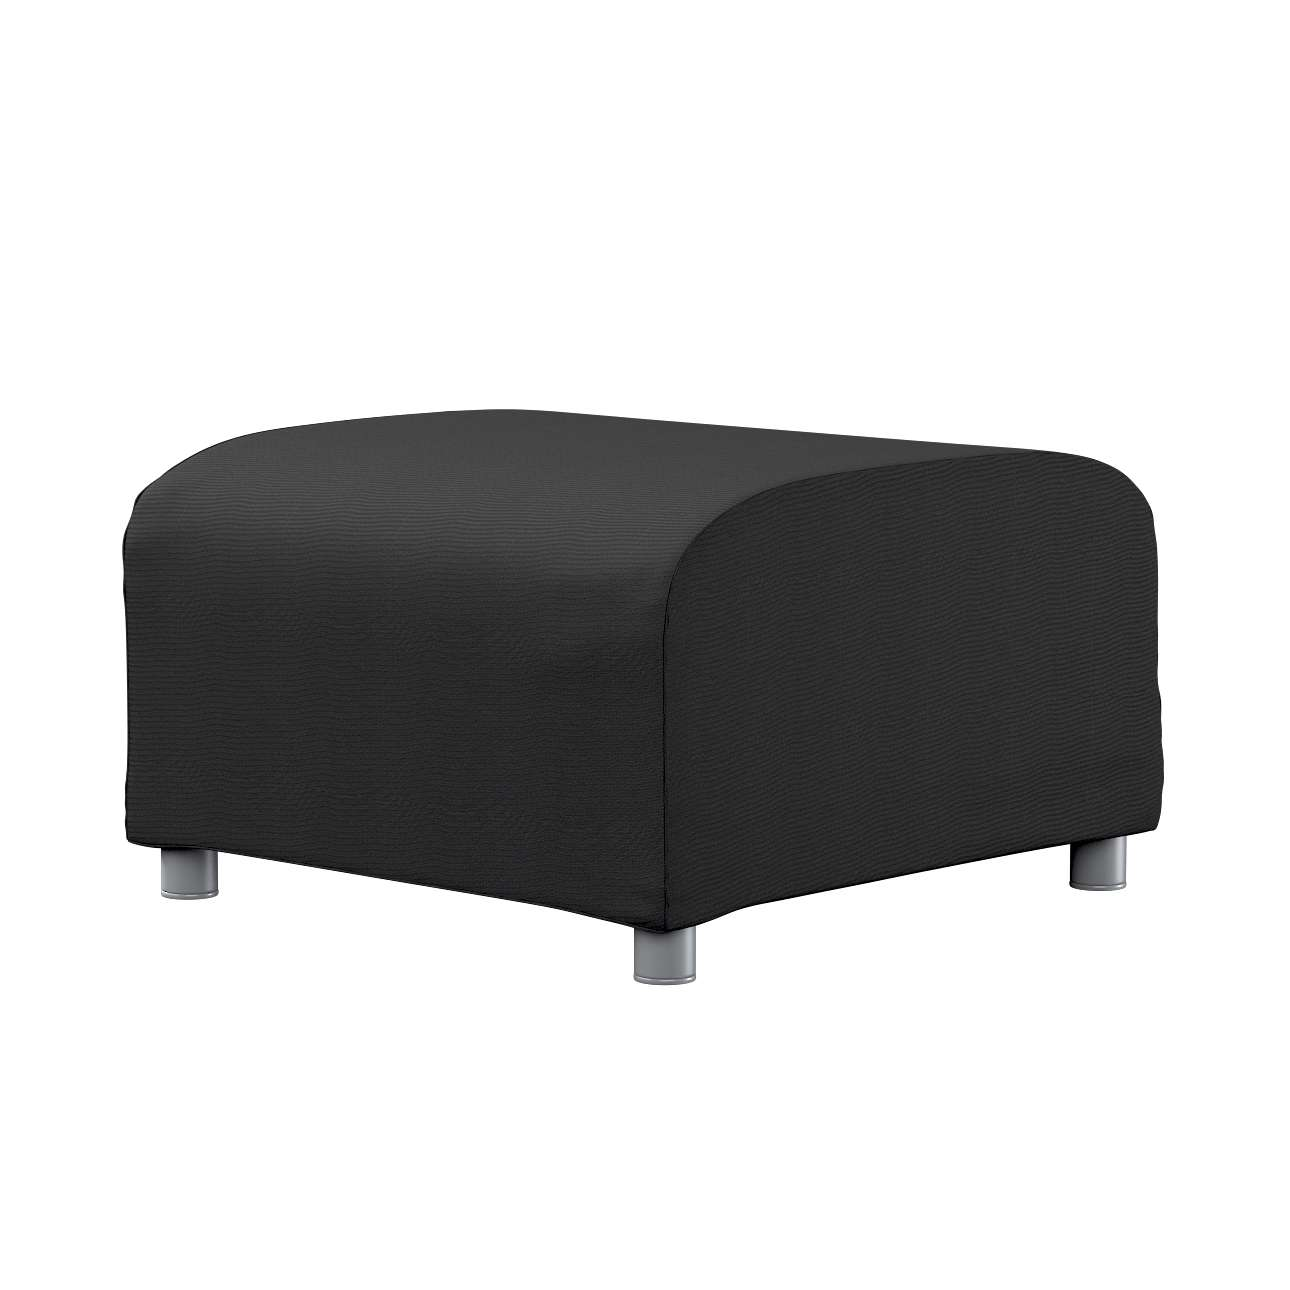 KLIPPAN pufo užvalkalas Klippan footstool cover kolekcijoje Etna , audinys: 705-00